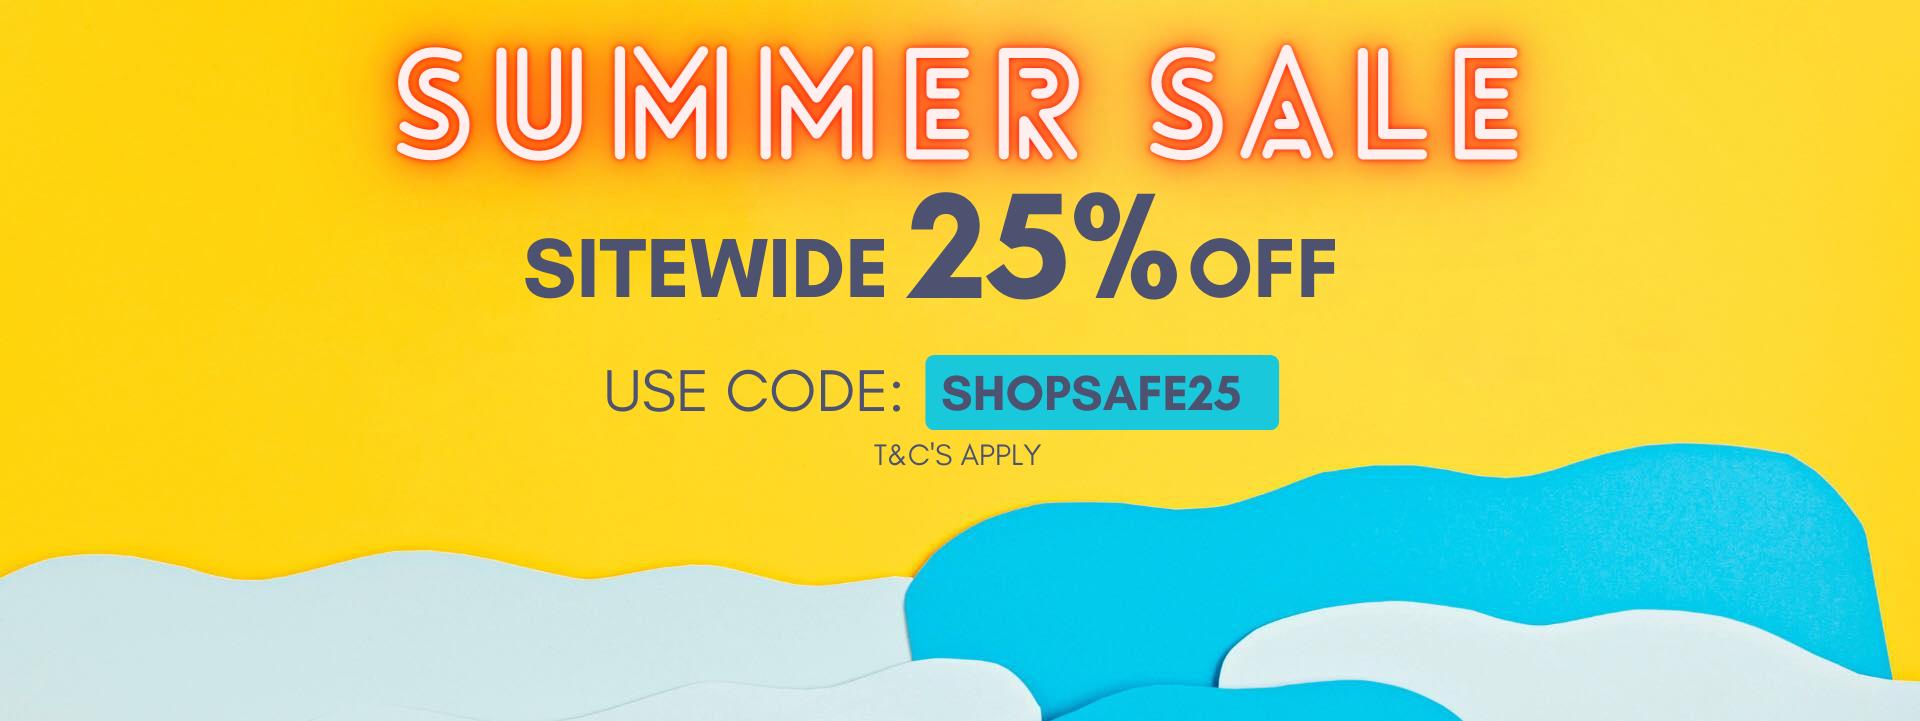 July Summer Sale